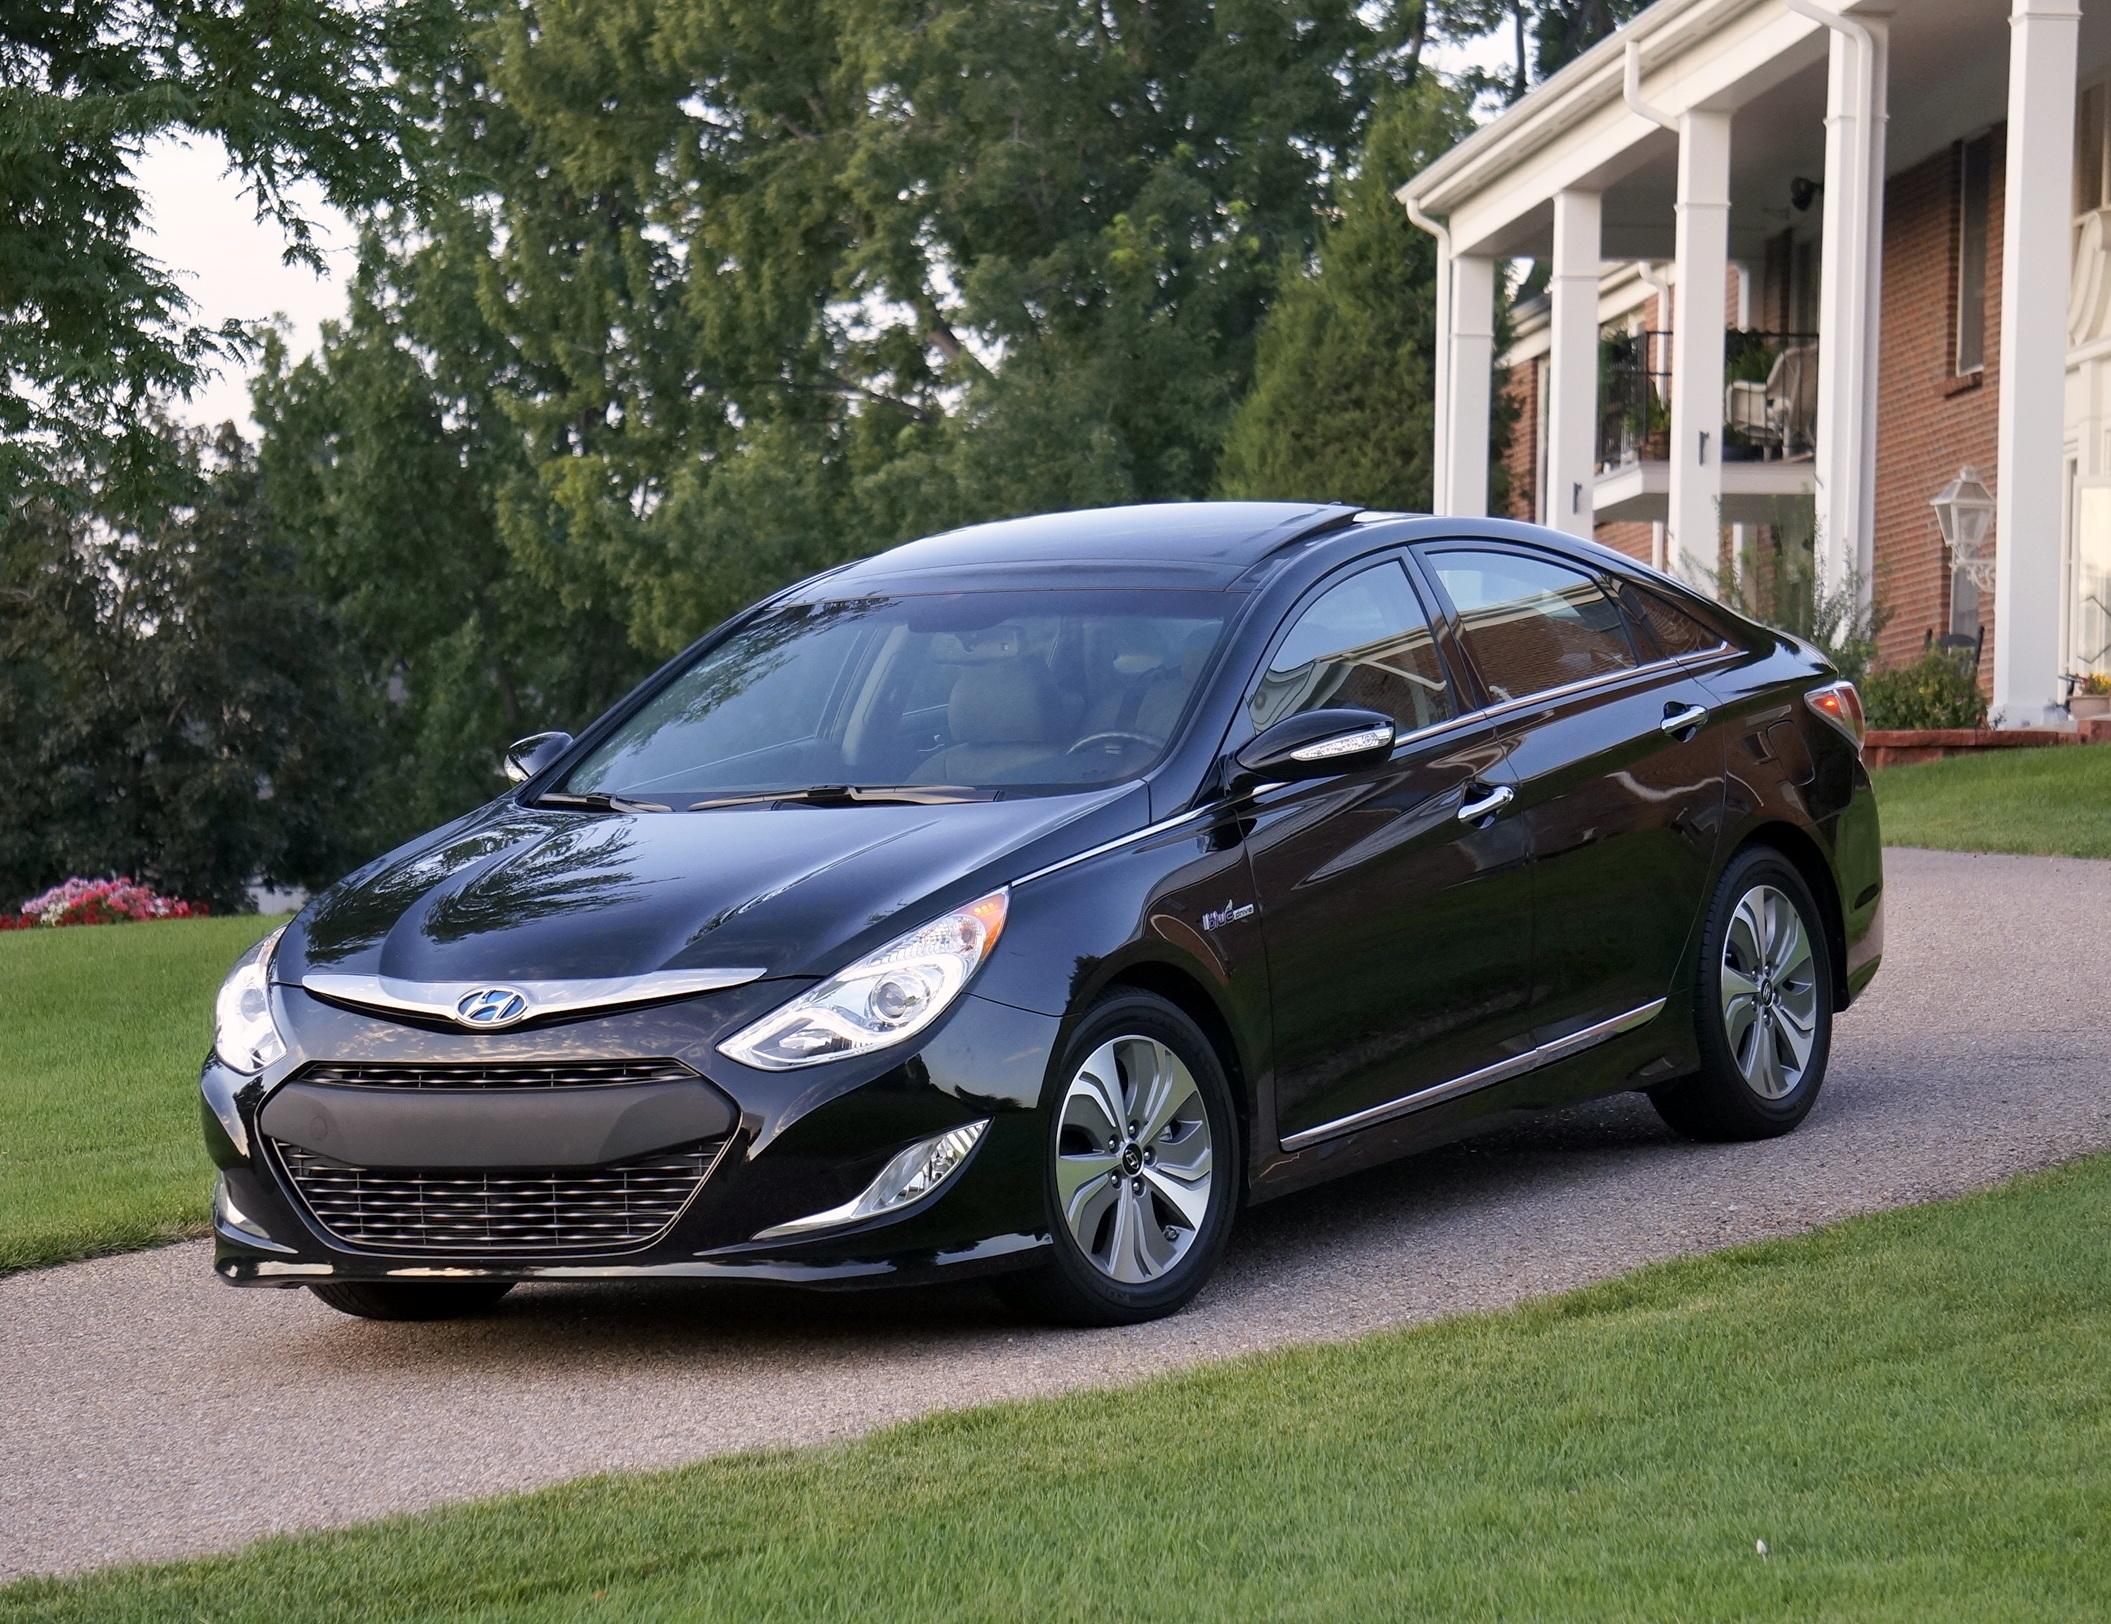 2013 Hyundai Sonata Fwd Hybrid Limited Stu S Reviews